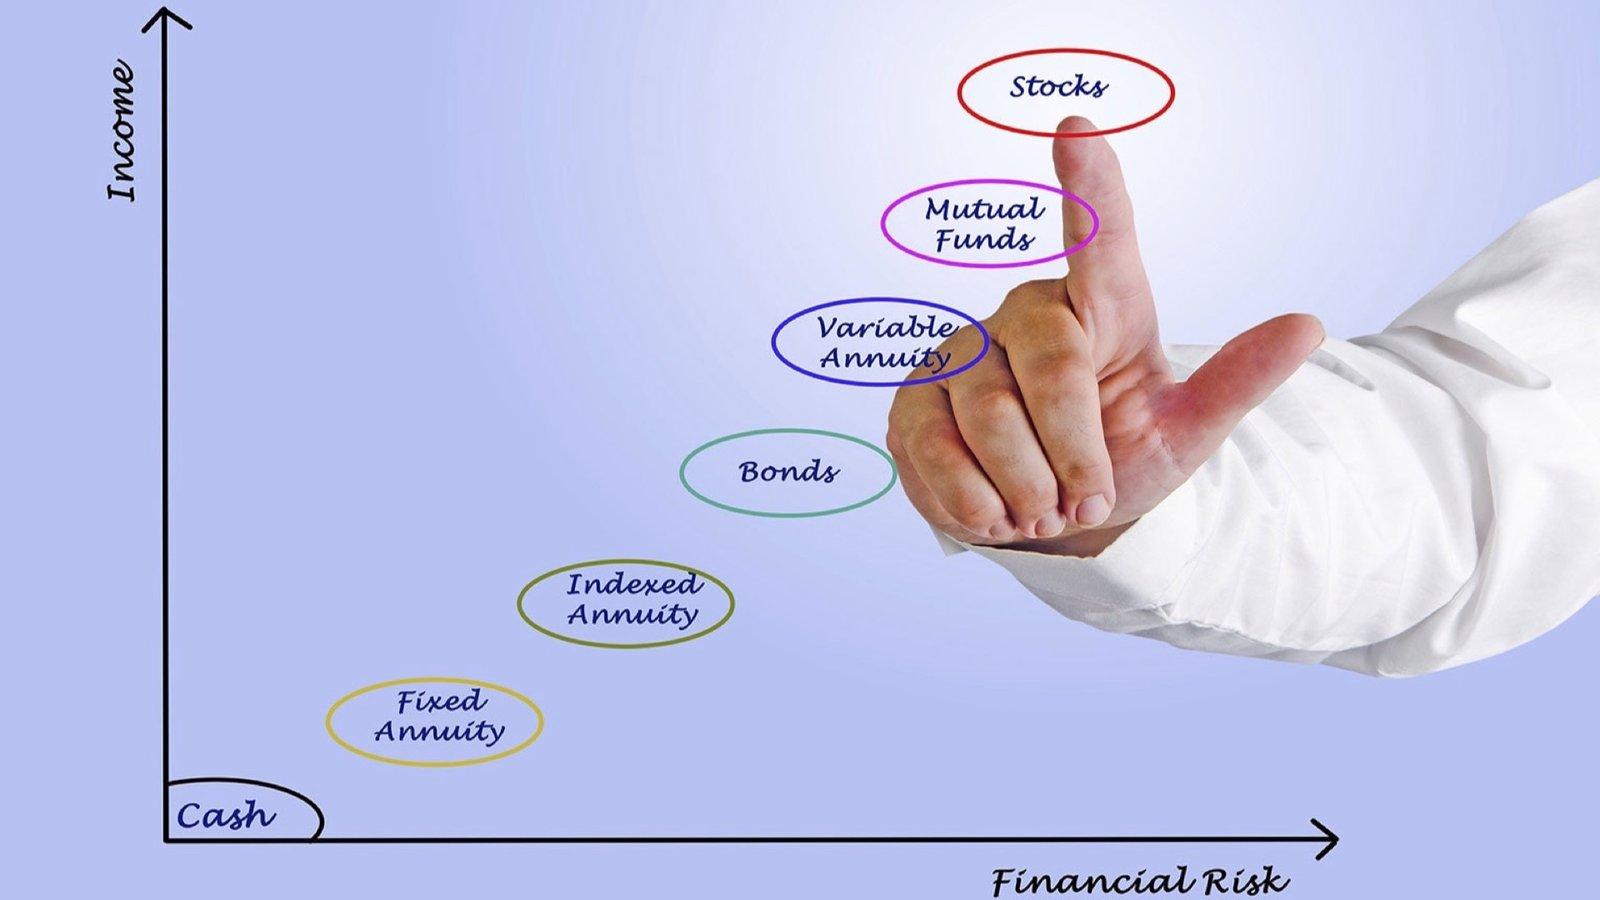 Basic Investing - Keep It Simple